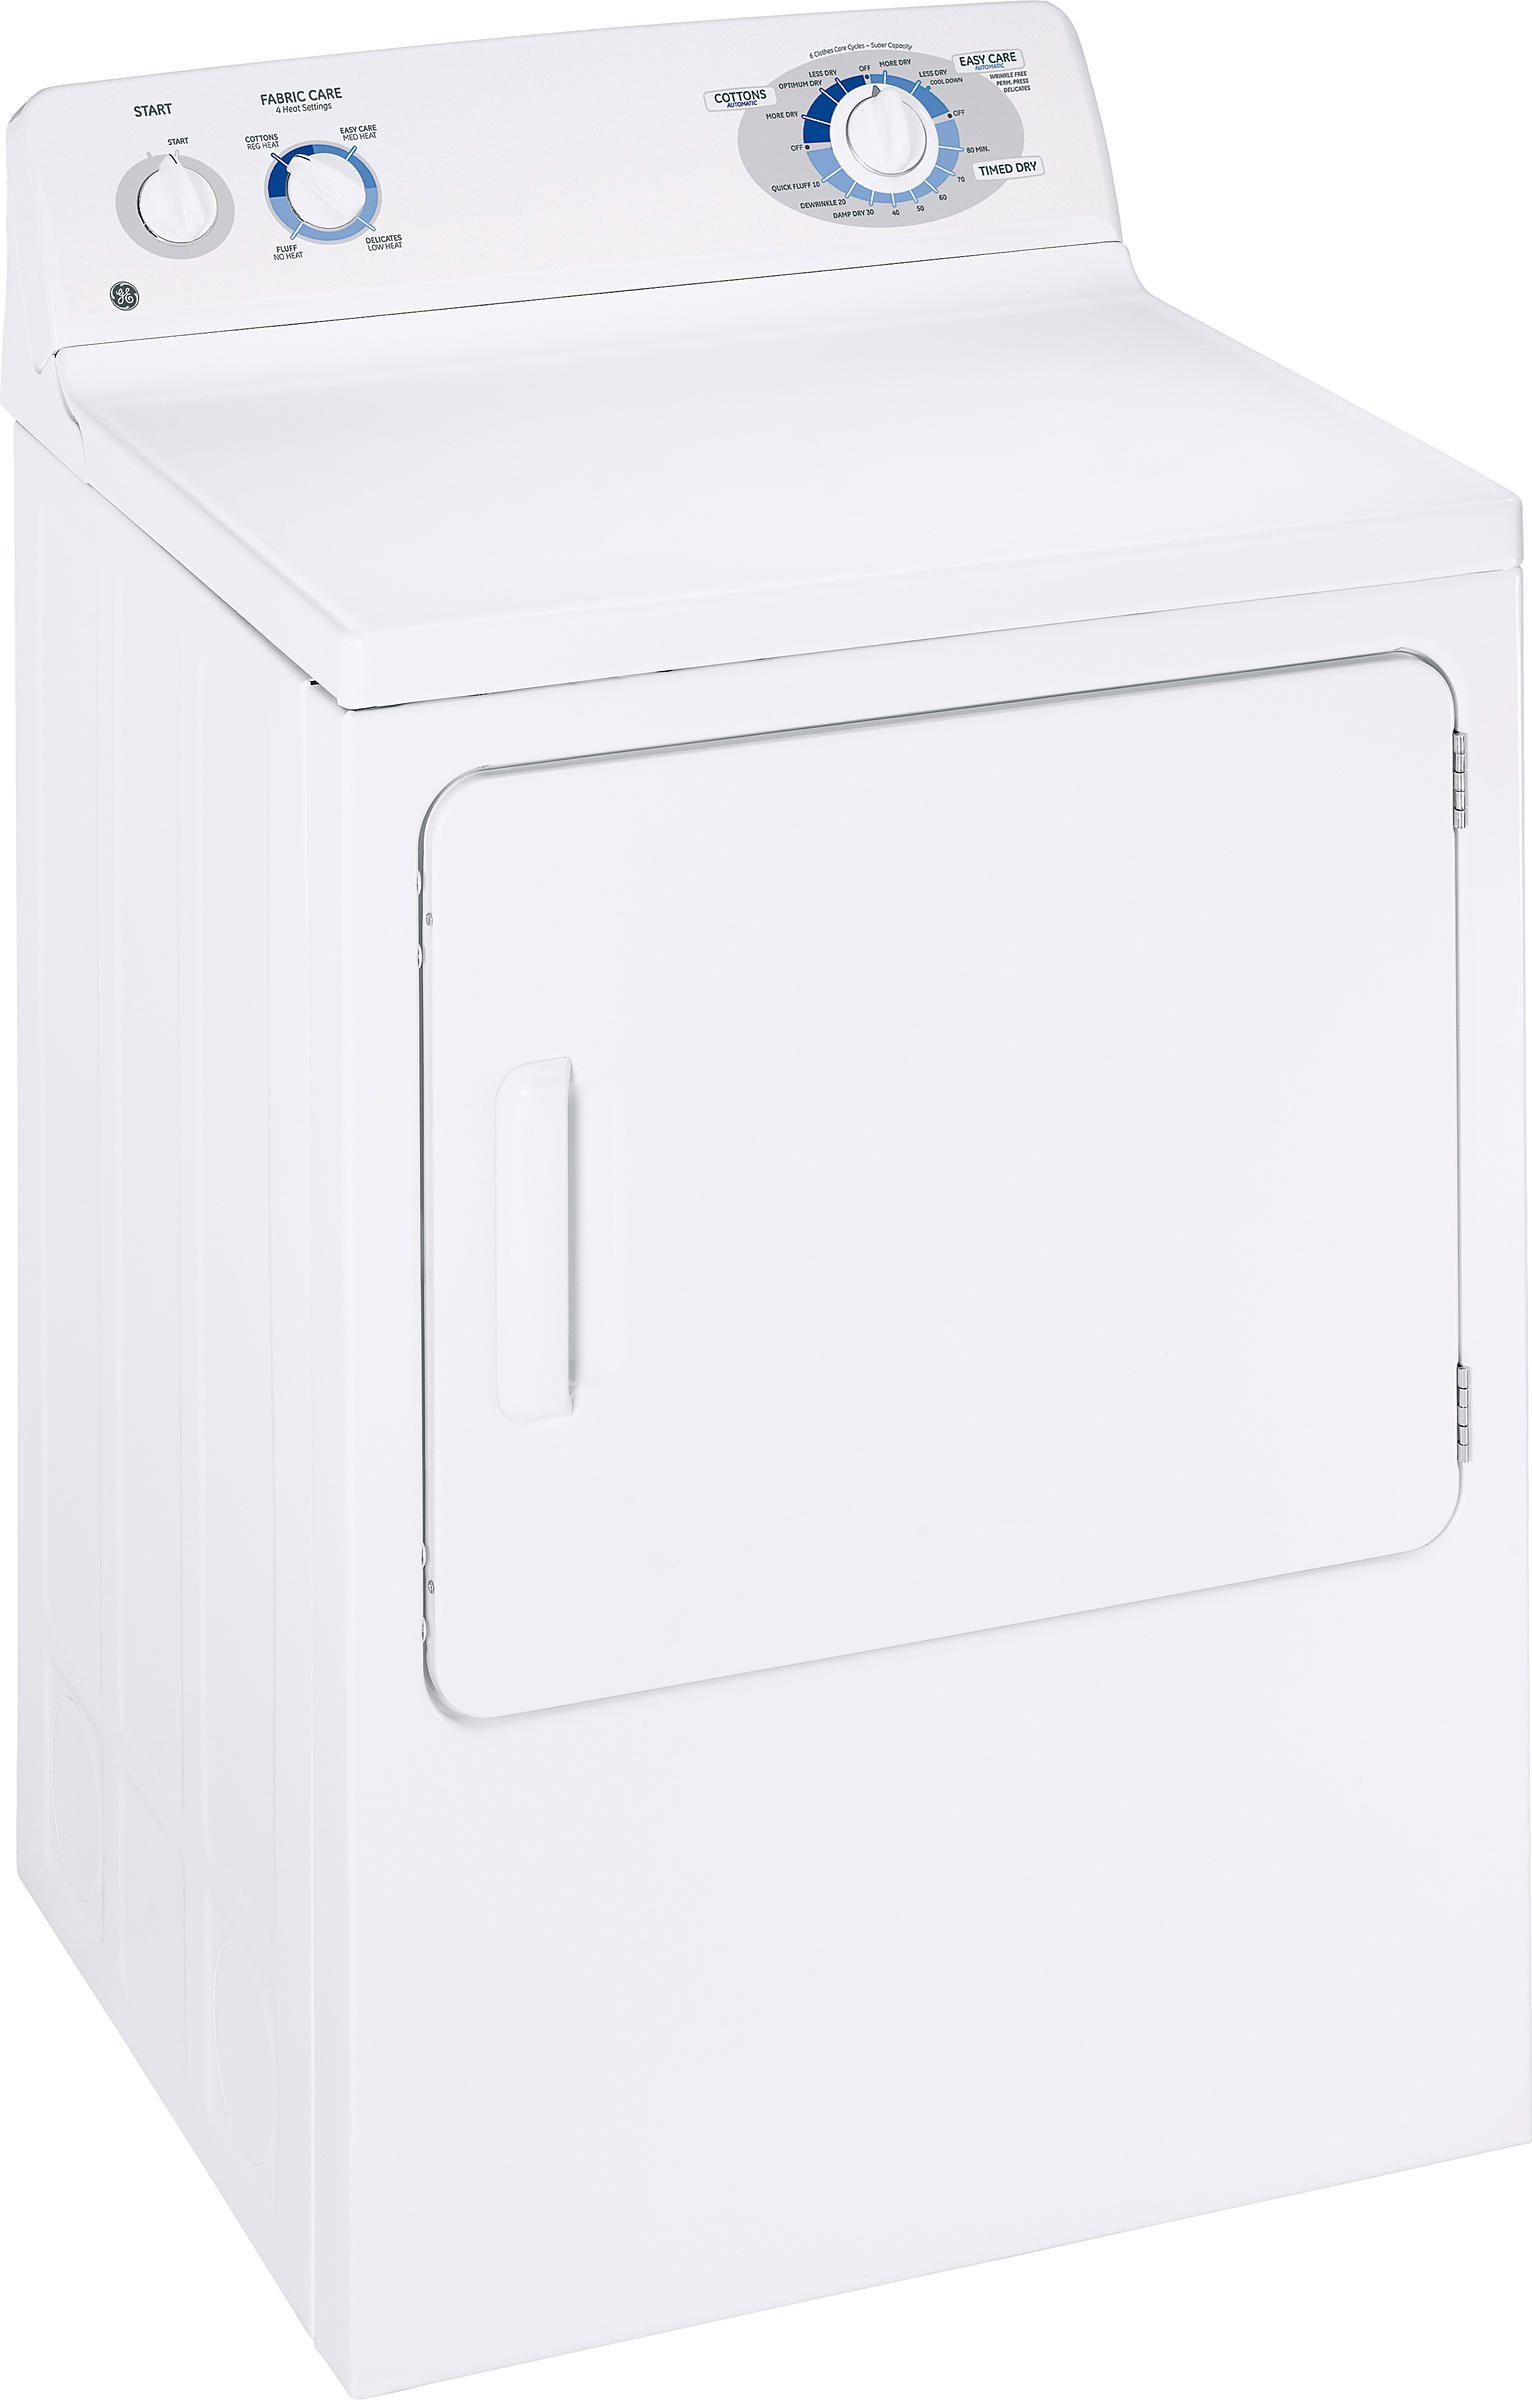 small resolution of ge model dbxr463eg1ww residential dryer genuine parts rh searspartsdirect com ge dryer repair manual ge front